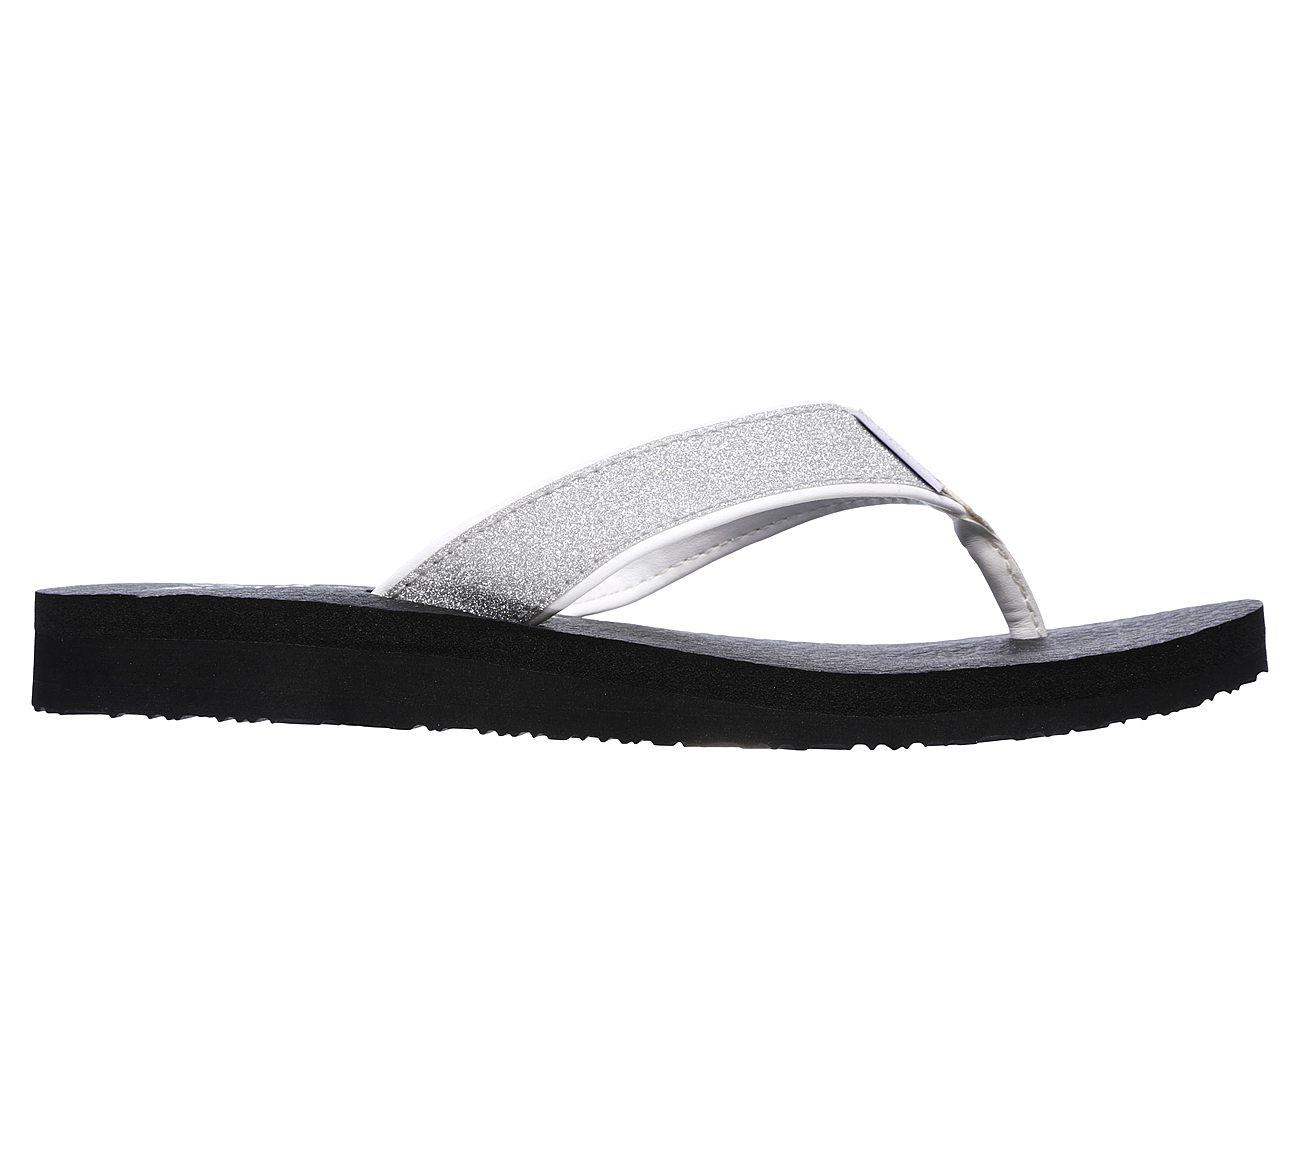 91d9924e1433 white skechers flip flops sale   OFF63% Discounted